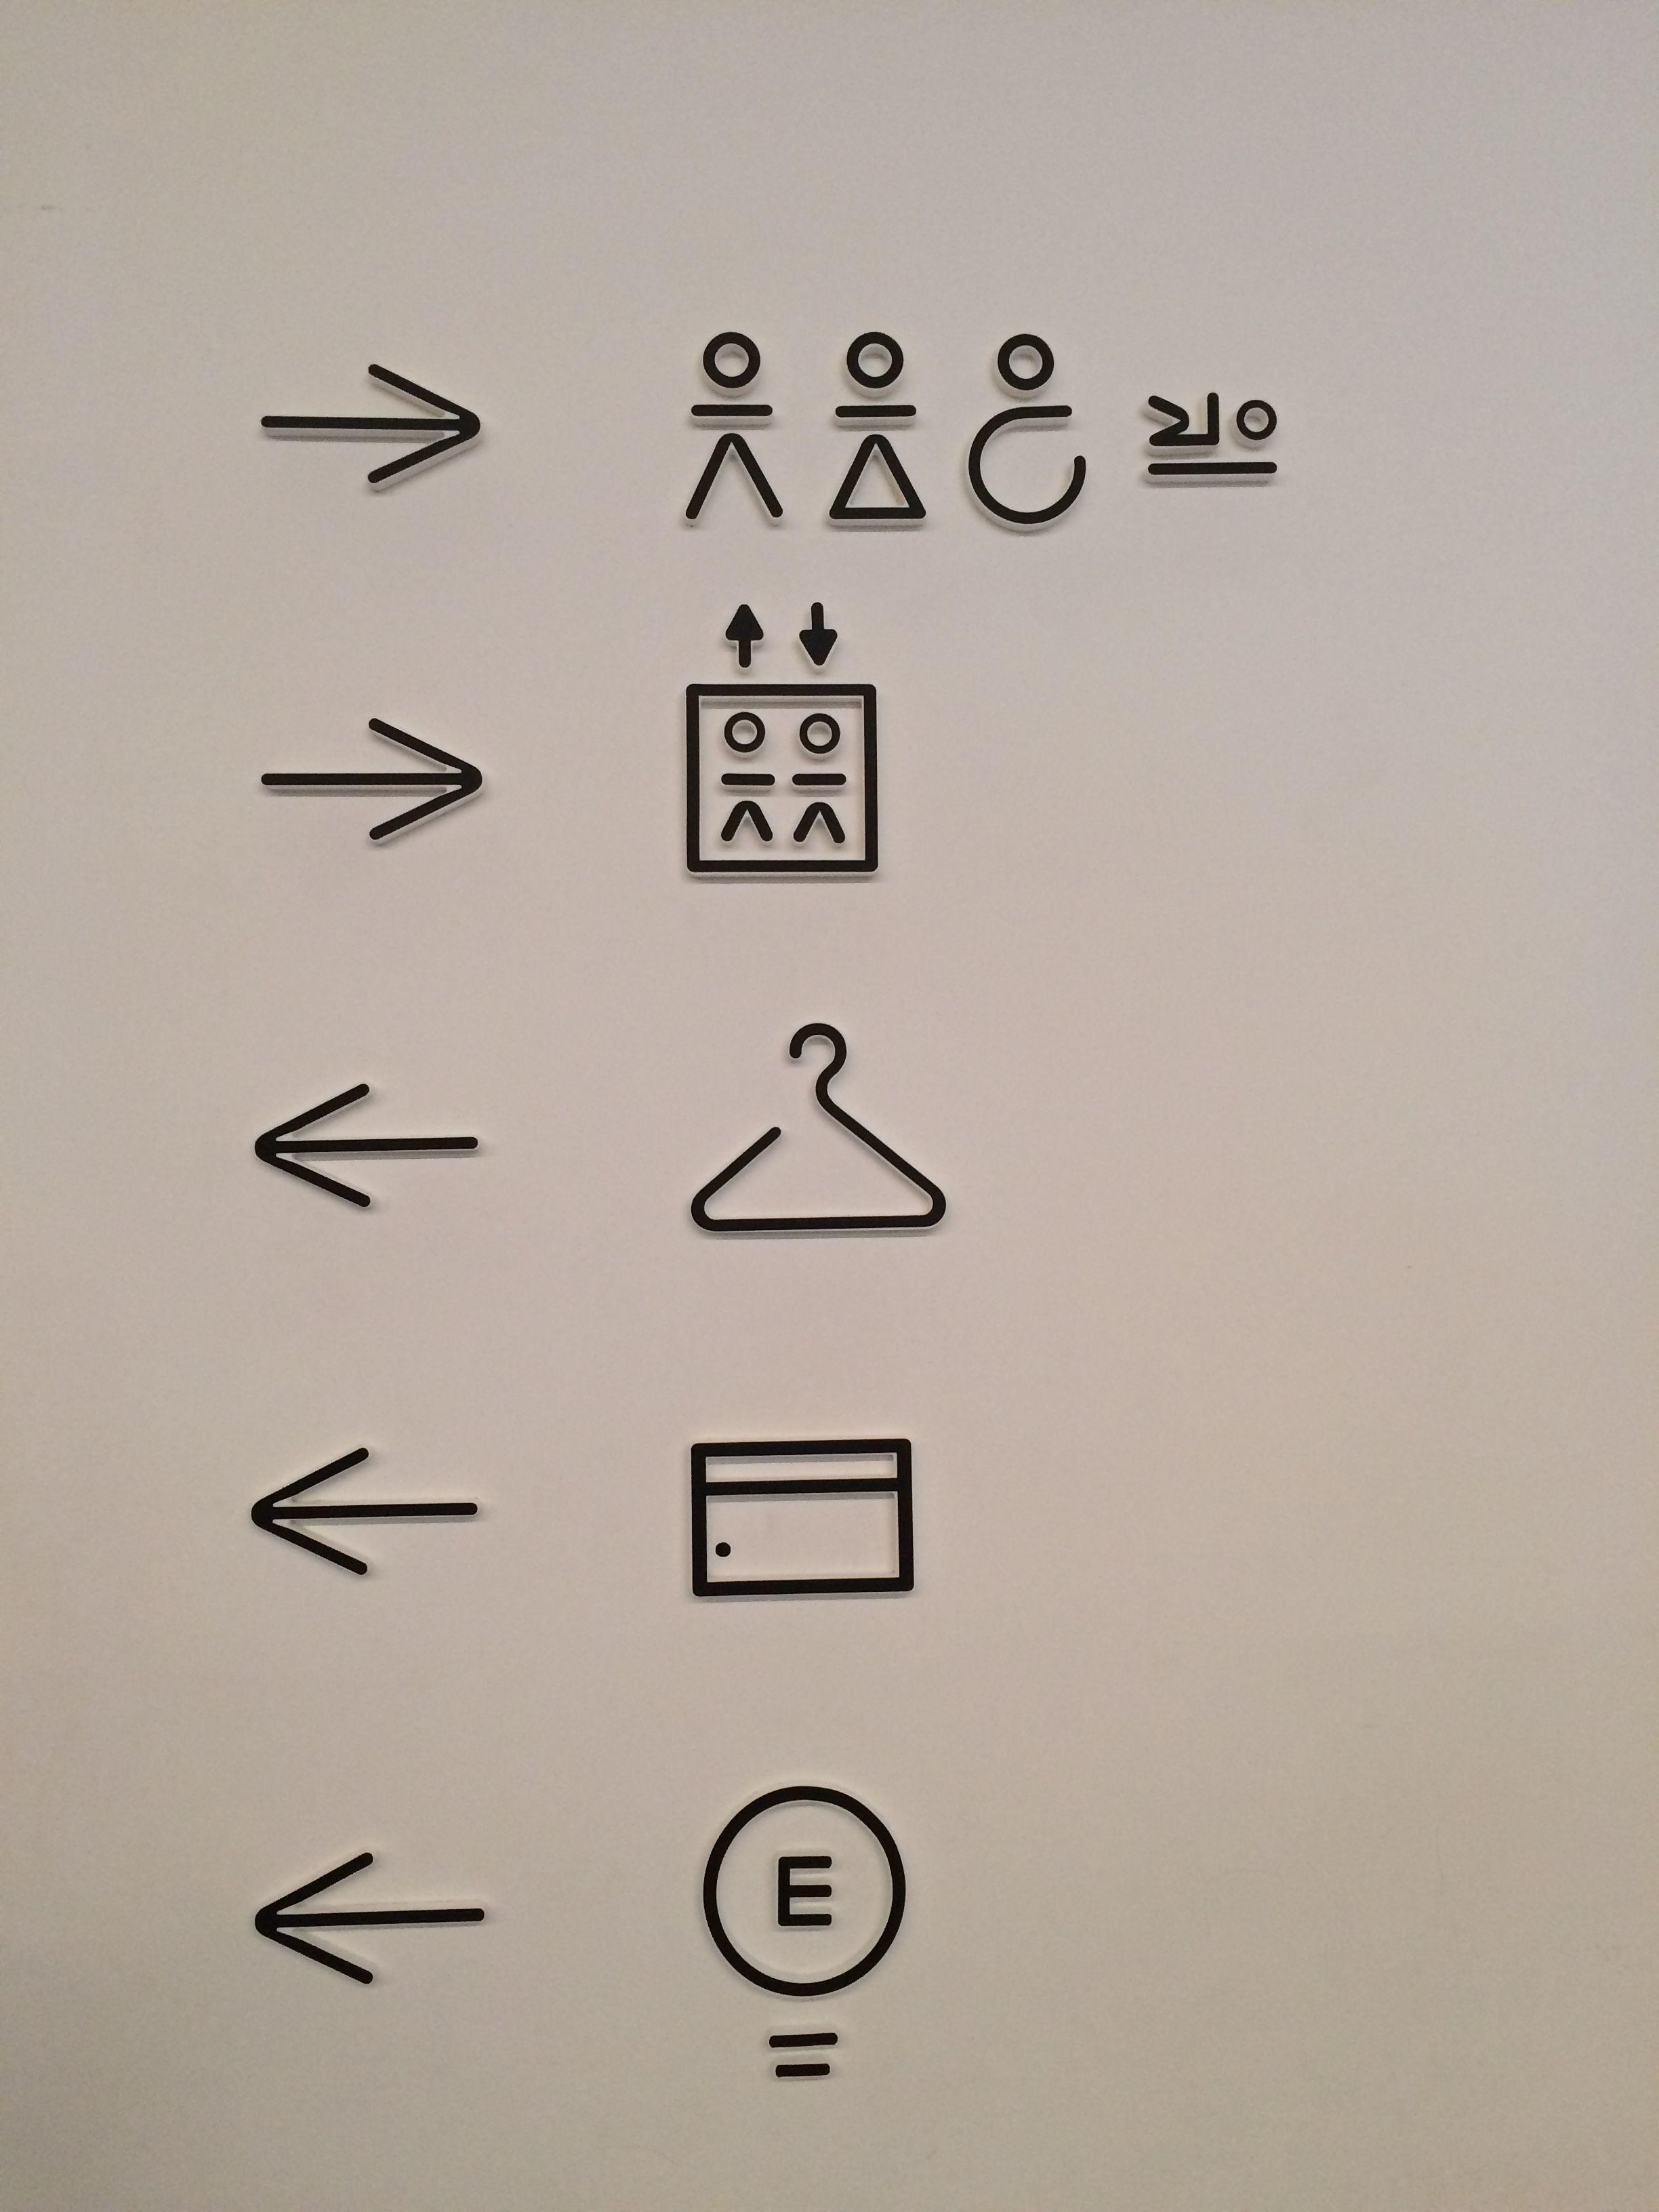 Pin By Chun Yiu Fu On Signage Directional Signage Wayfinding